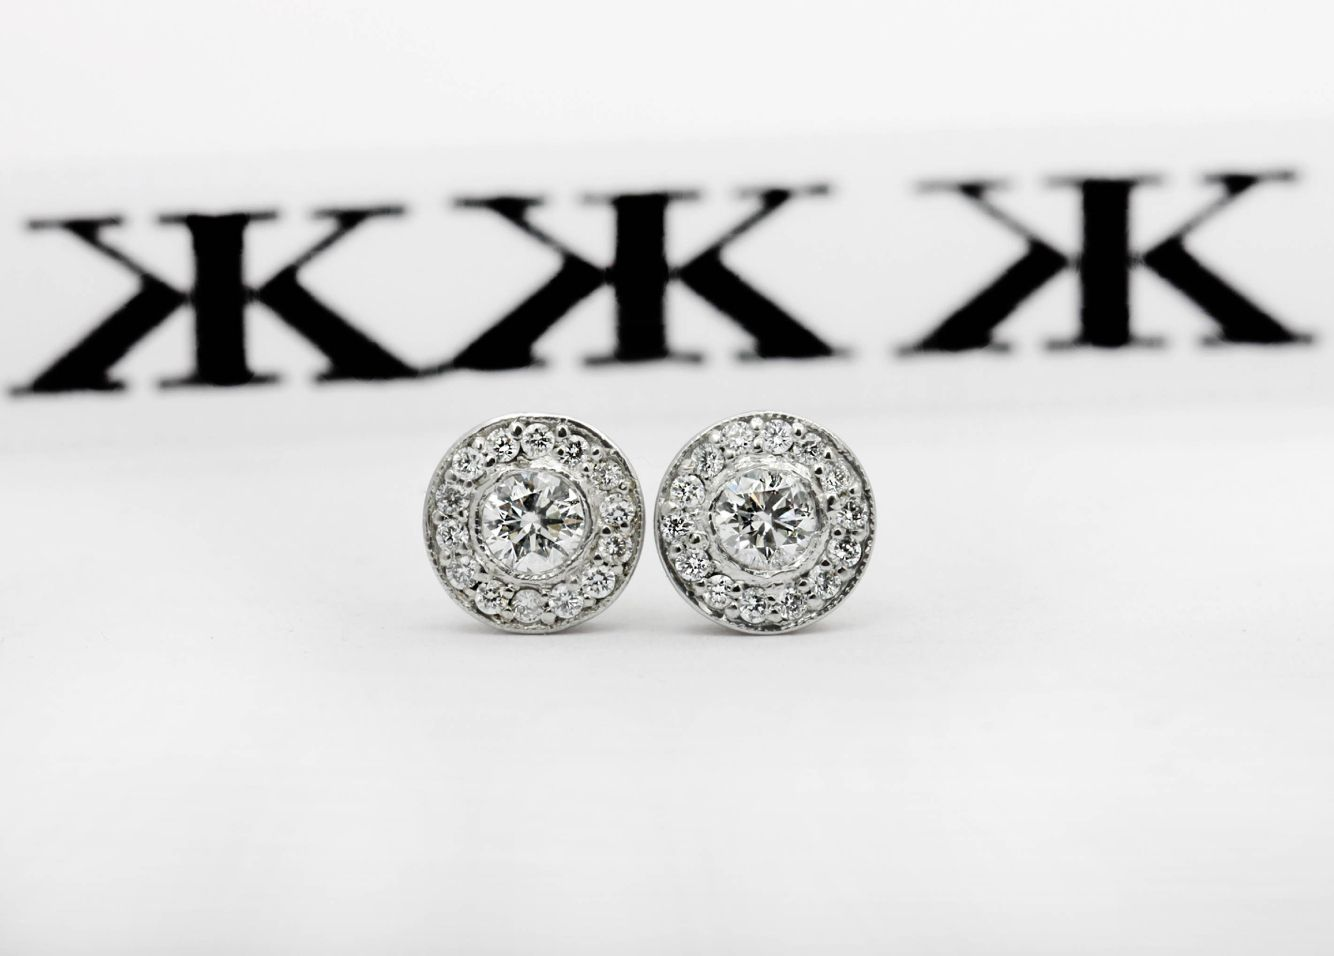 #diamondhaloearrings#bykalfinjewellery #diamondringsmelbourne #jewellersmelbourne #diamondengagementringsmelbourne #design #details #diamondhalorings #custommaderings #artdeco #weddingrings #gentsring #genstjewellery #remodelling ##wedding www.kalfin.com.au